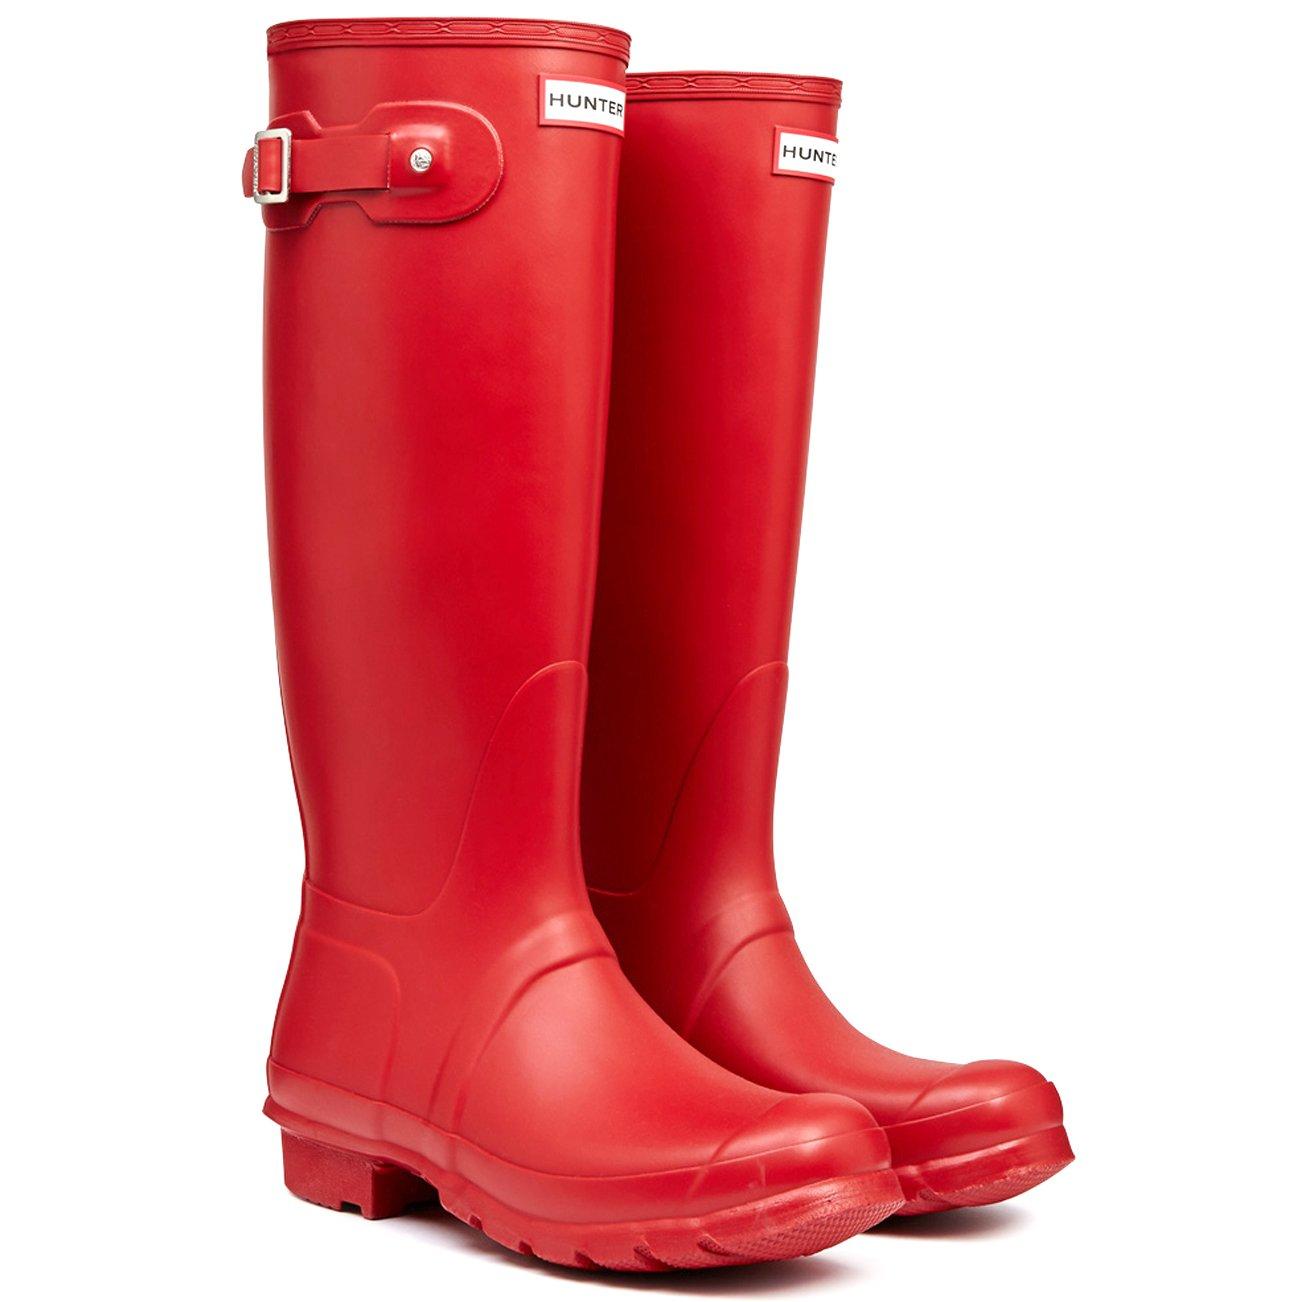 Hunter Womens Original Tall Winter Rain Festival Snow Wellington Boots B00NGPS4K4 10 M US Hunter Red